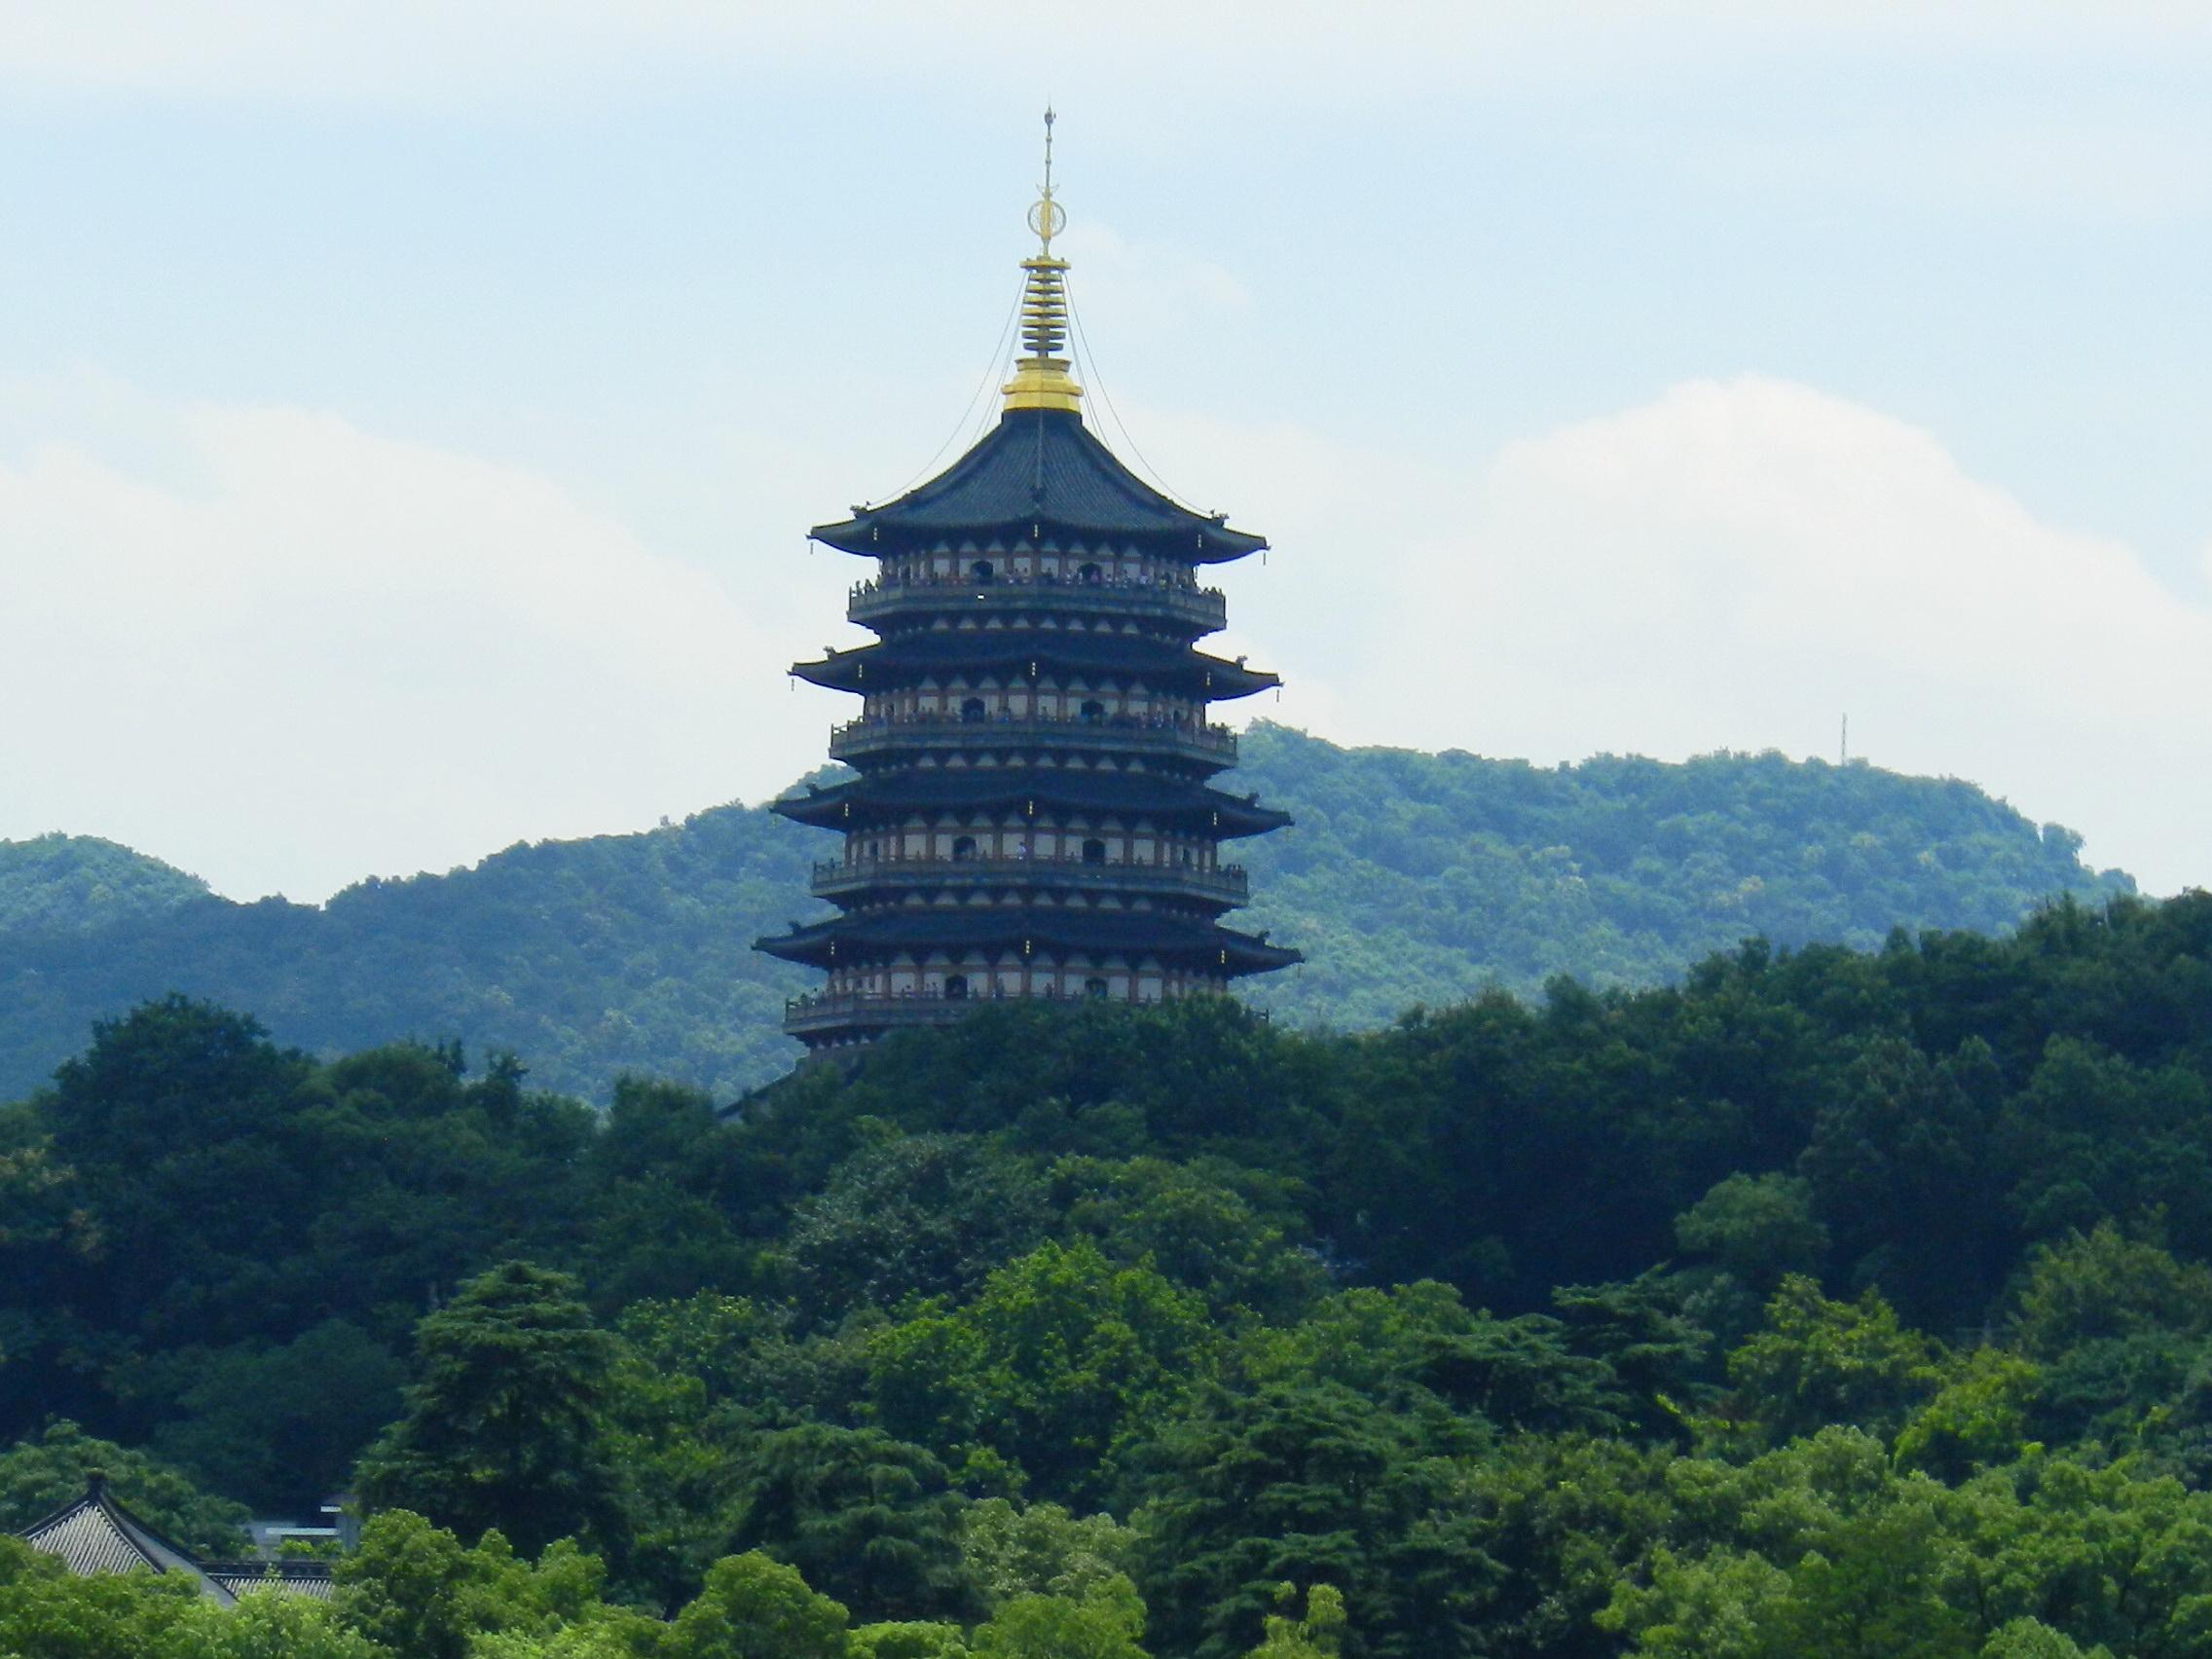 Leifeng Pagoda 雷峰塔 - panoramio.jpg